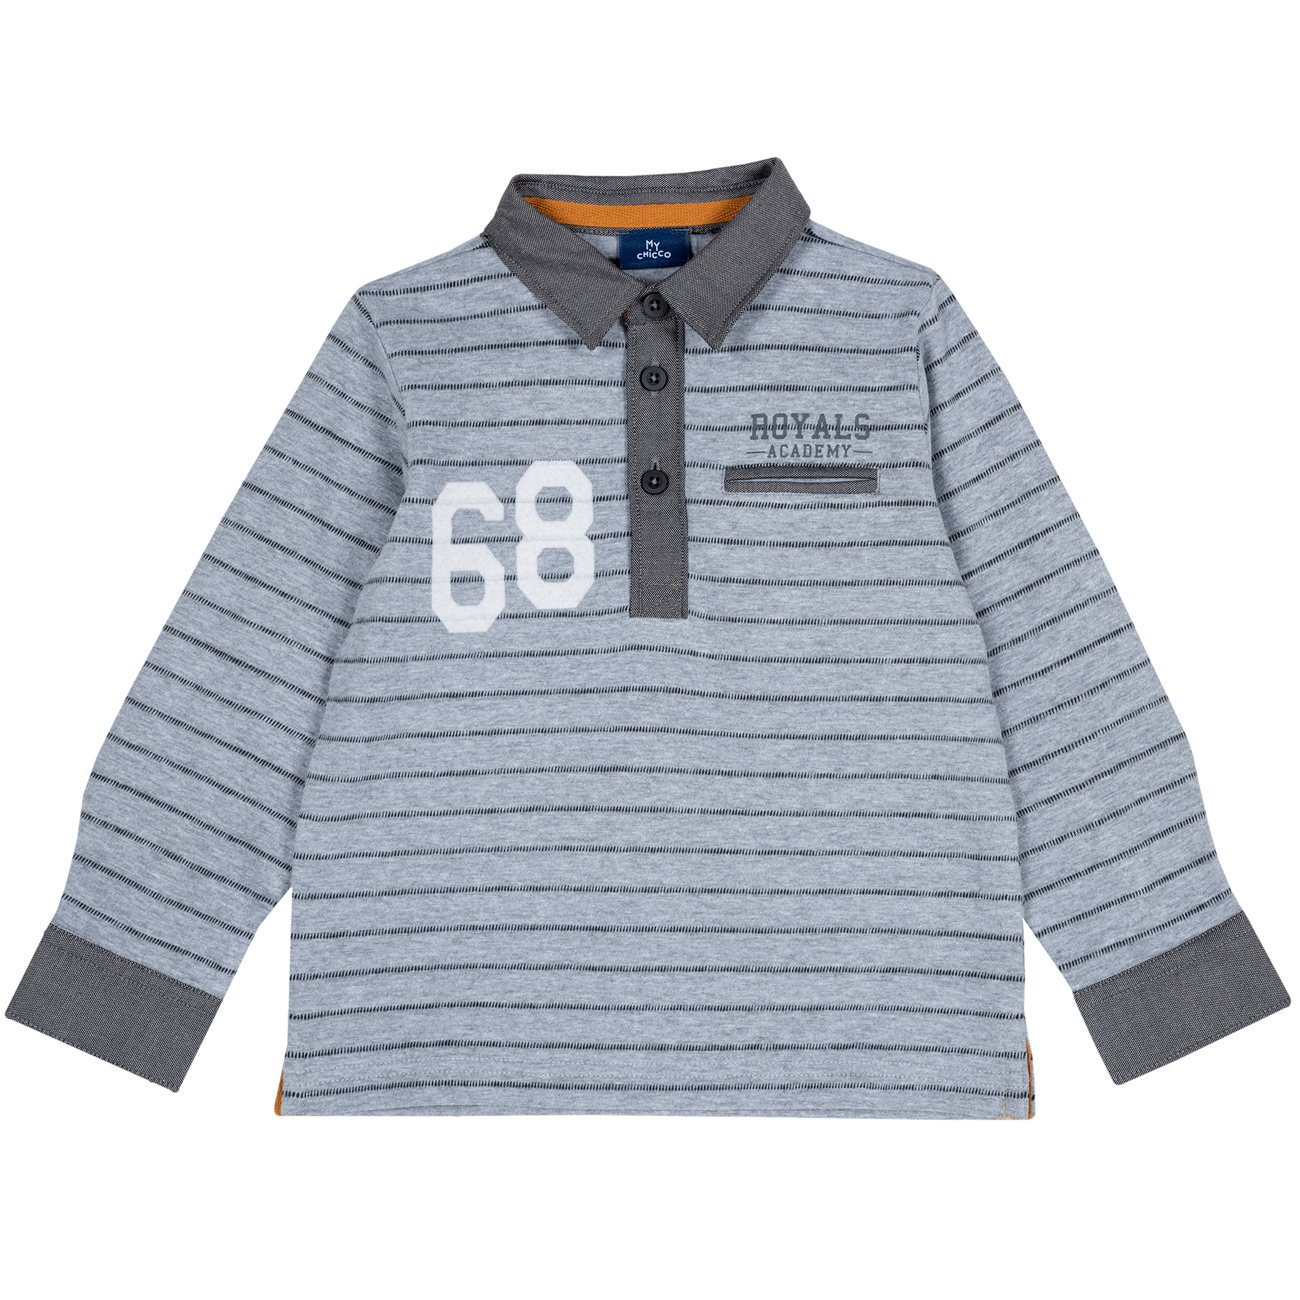 Tricou copii Chicco, gri, 33460